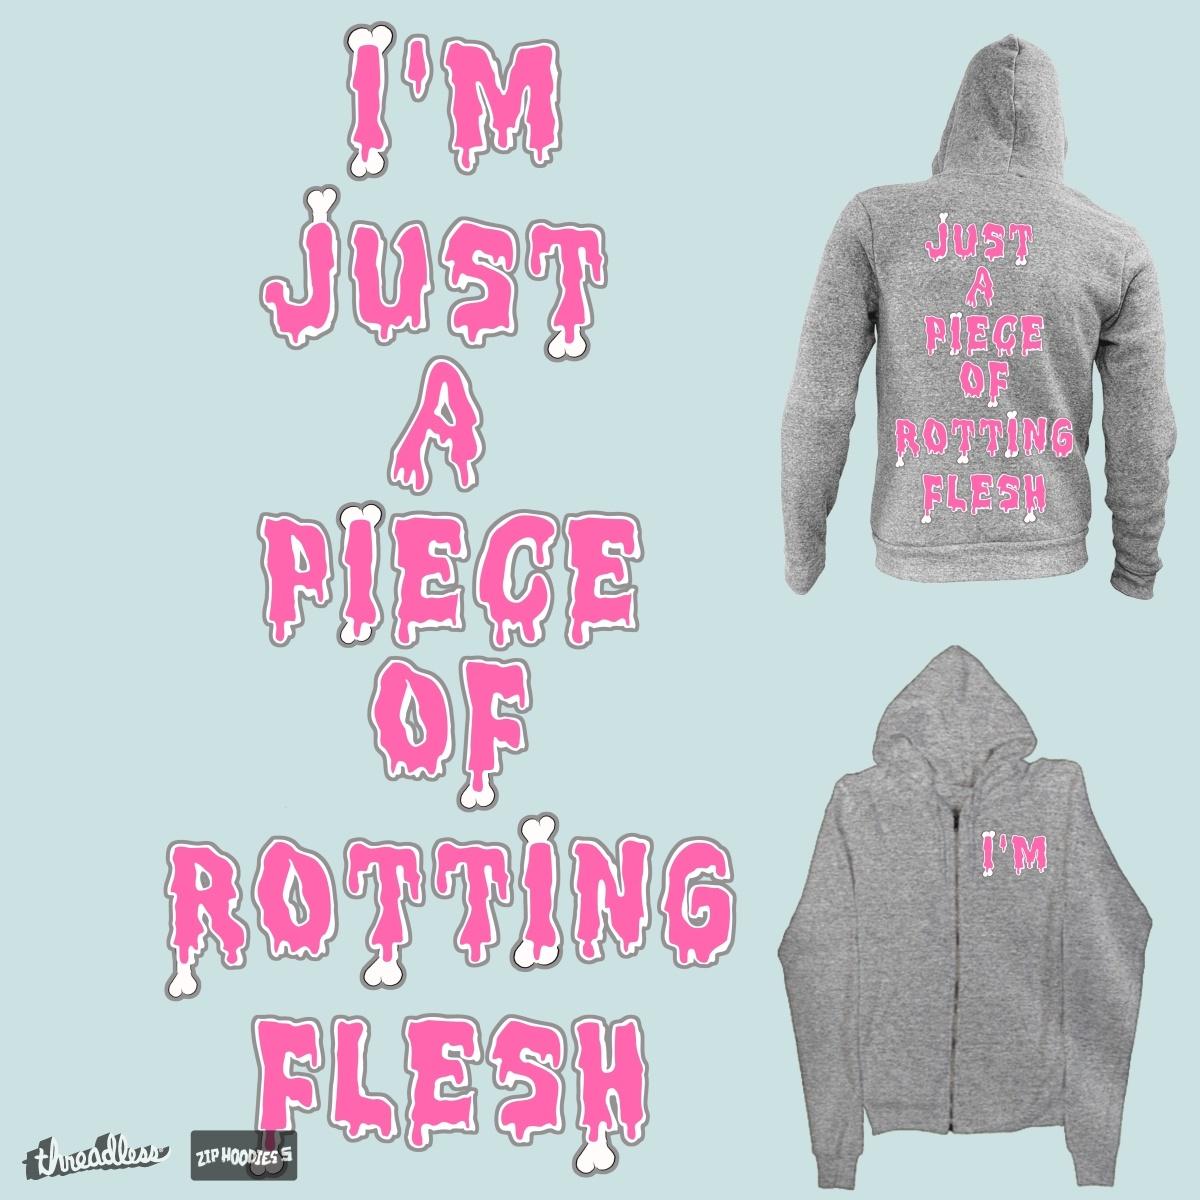 flesh! by gasponce on Threadless